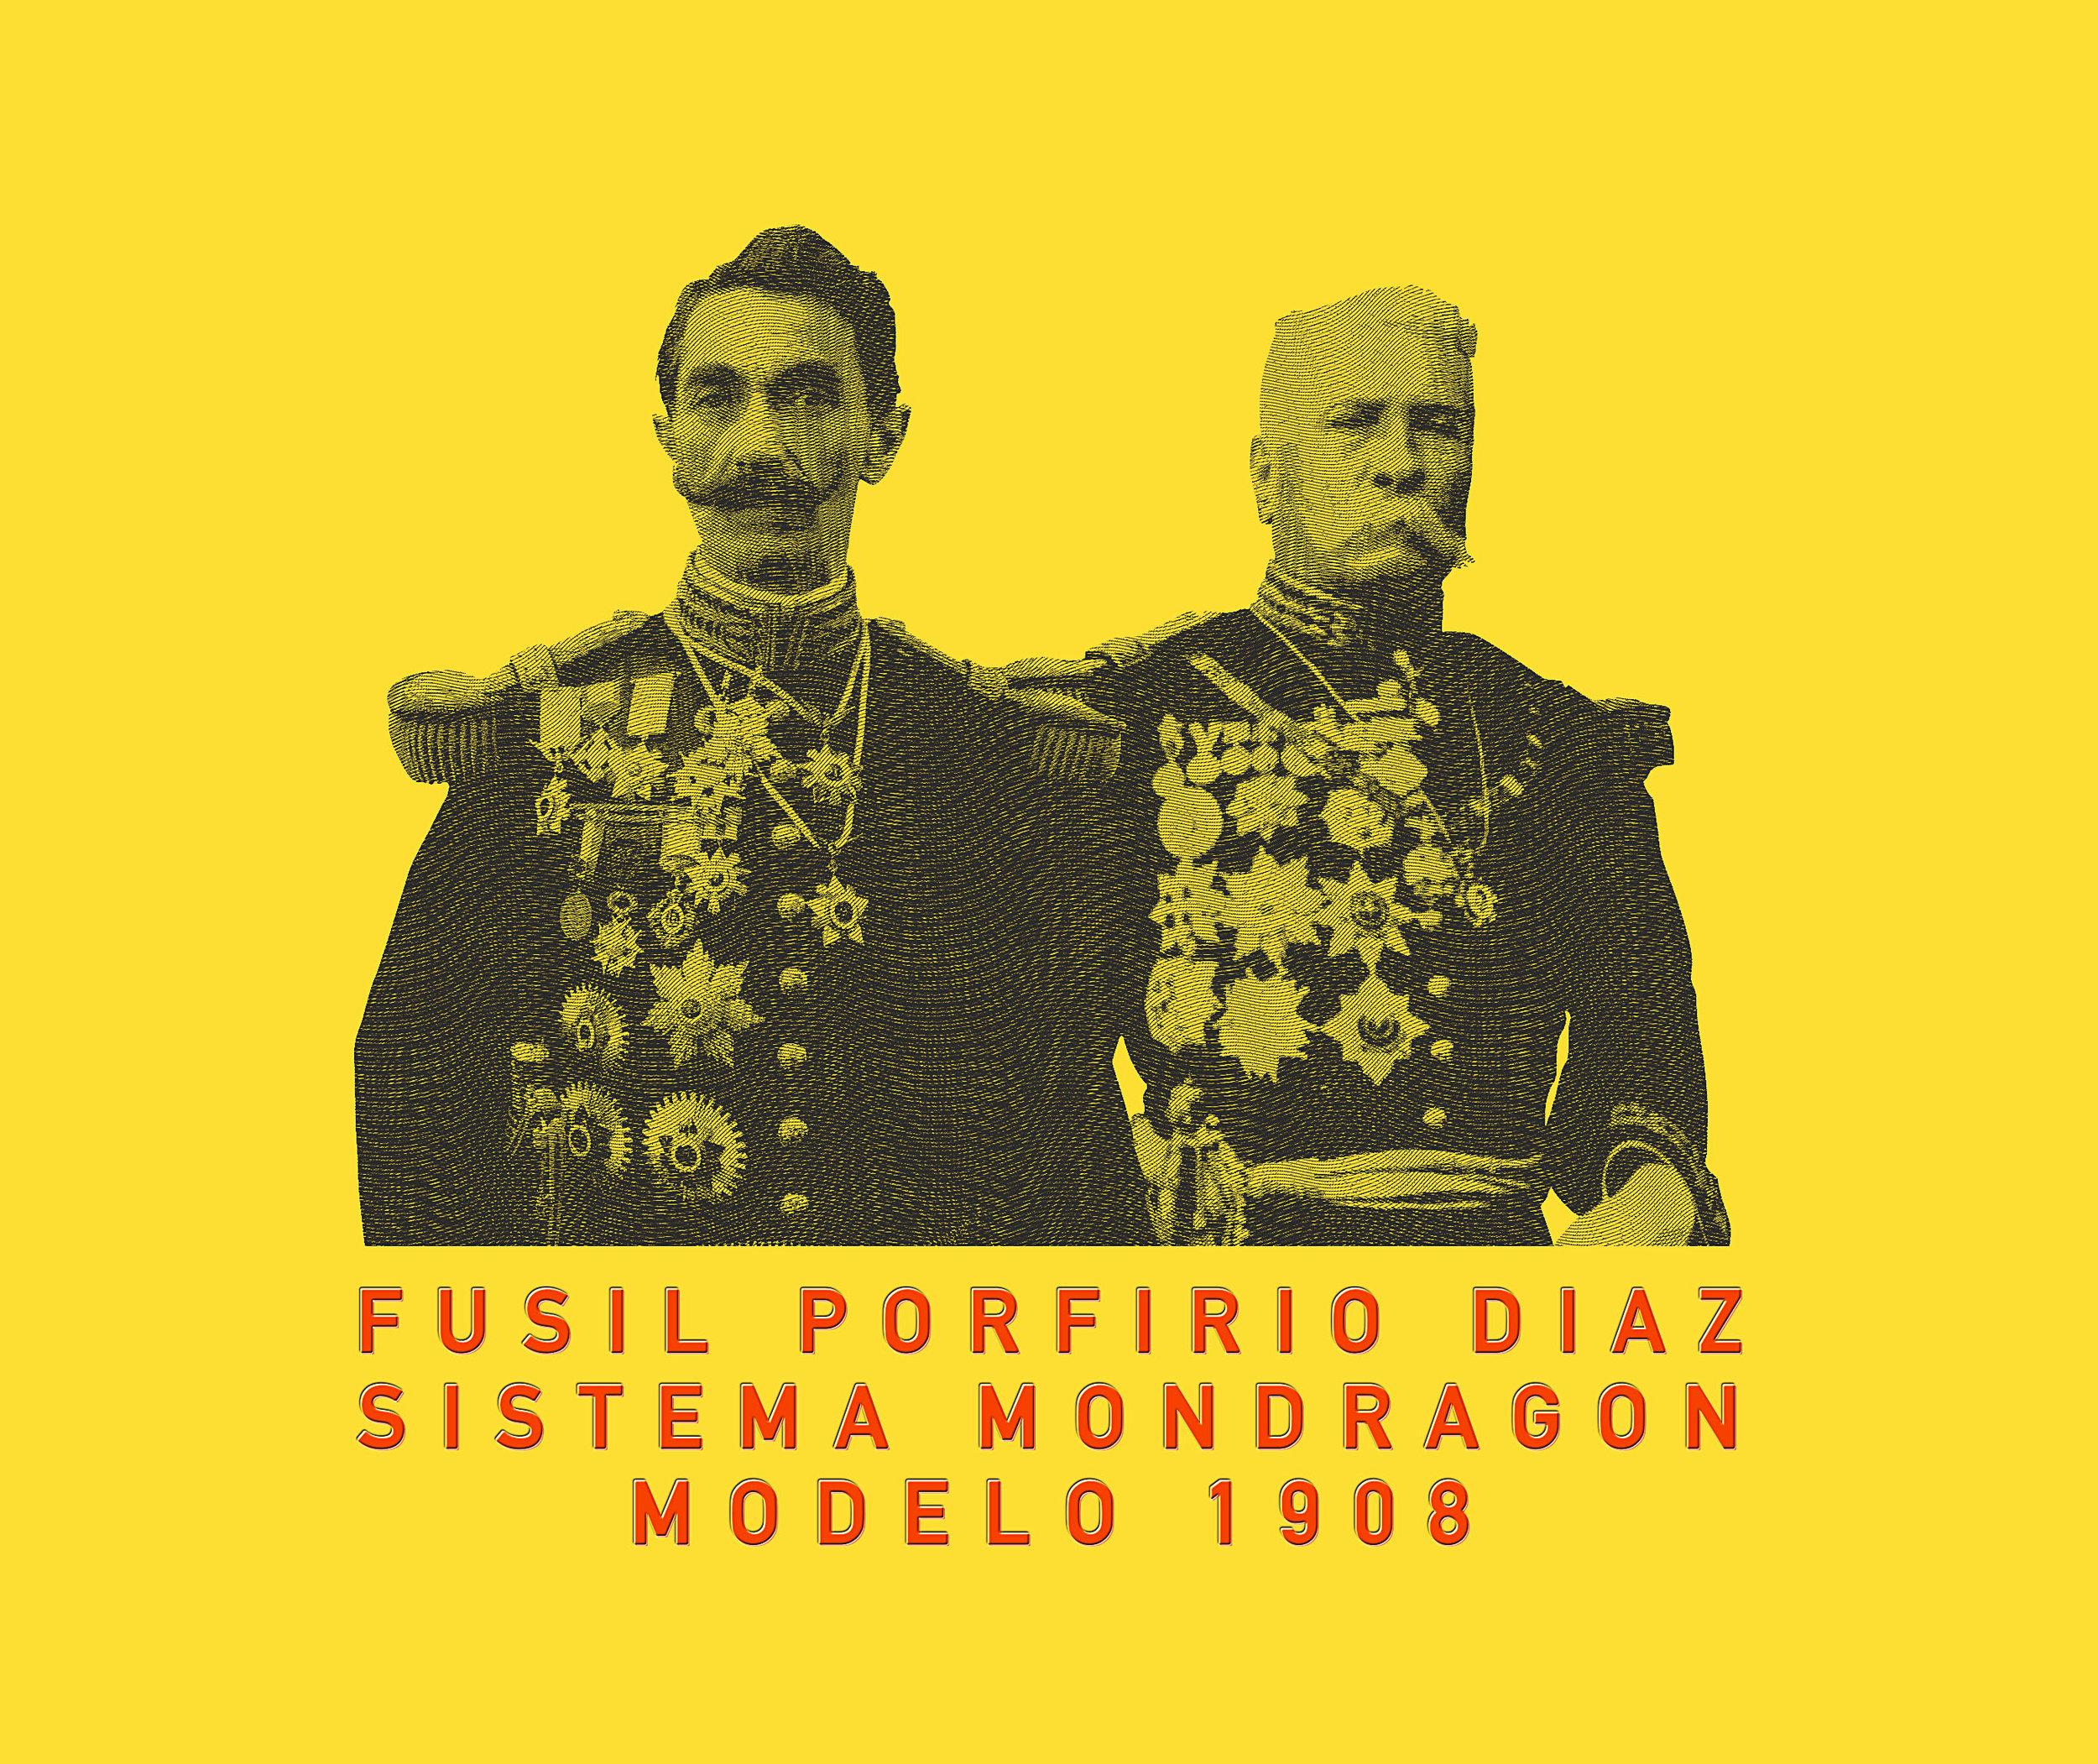 Diaz - Modragon.jpg